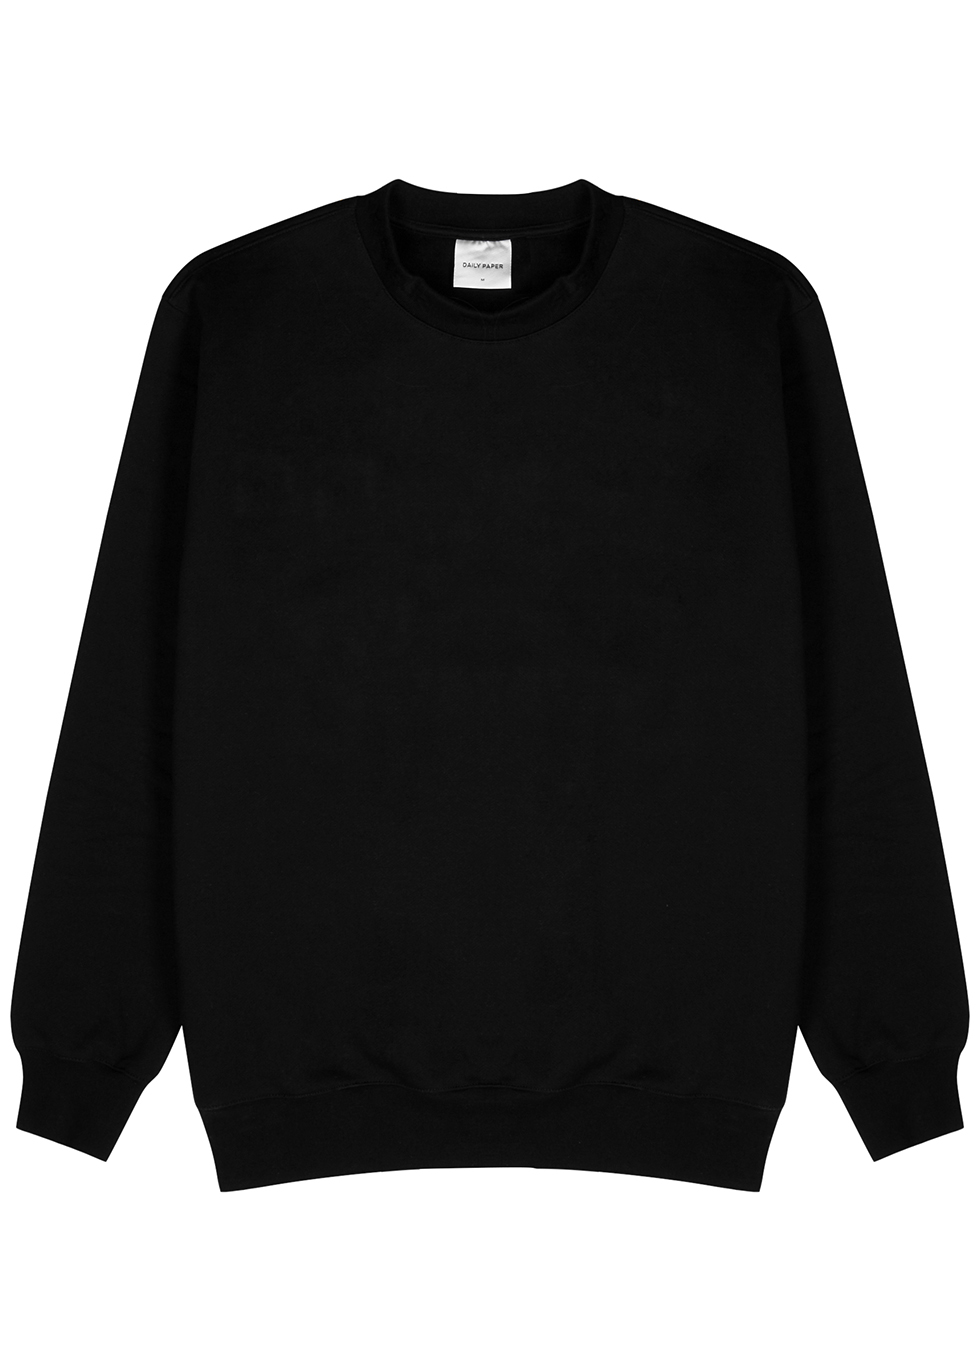 Derib black cotton sweatshirt